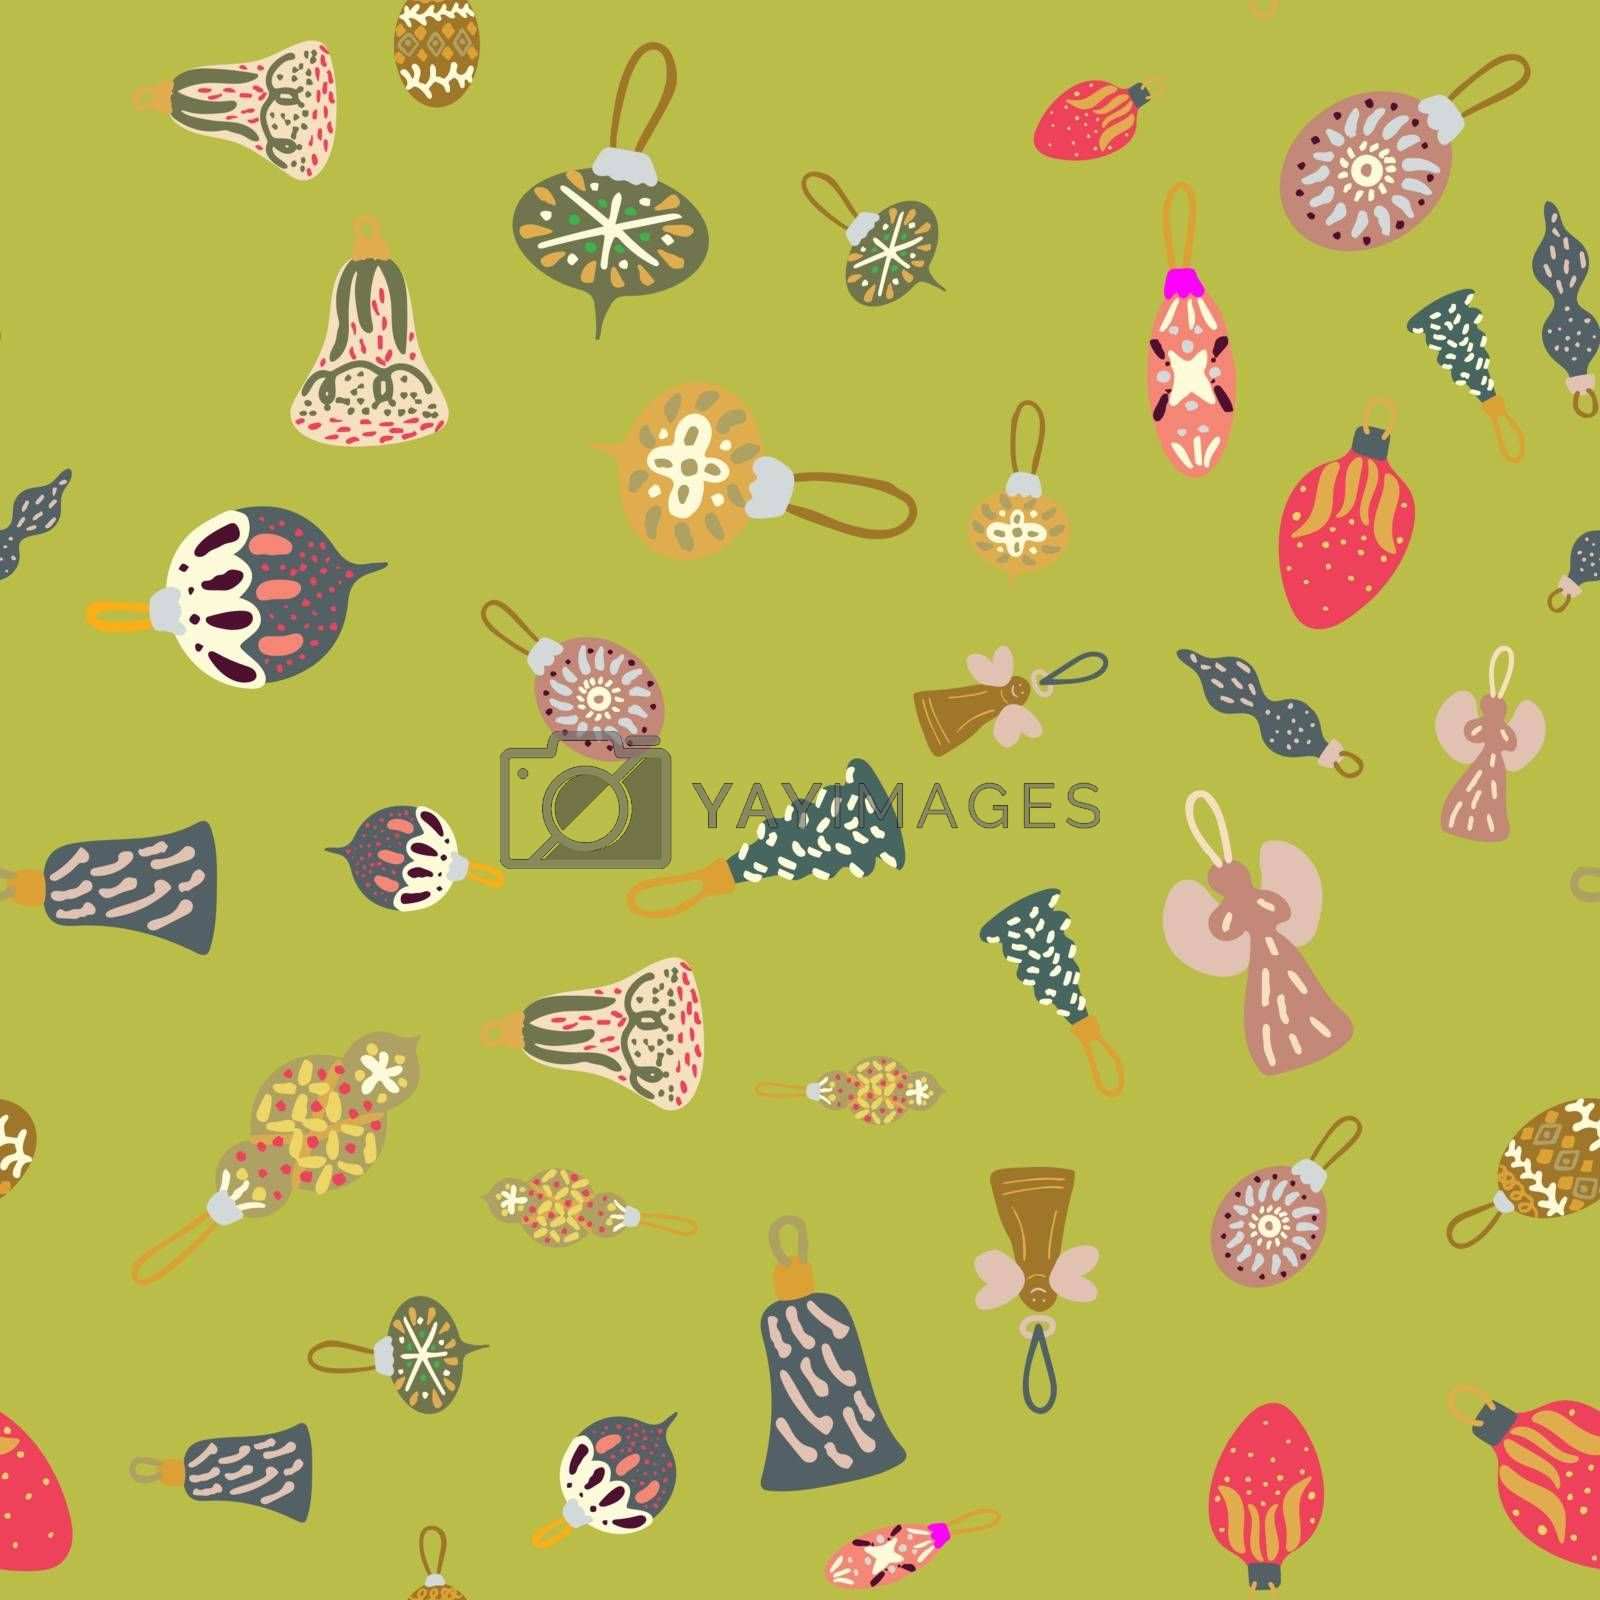 Royalty free image of Christmas tree decor seamless pattern on bright green background by Nata_Prando